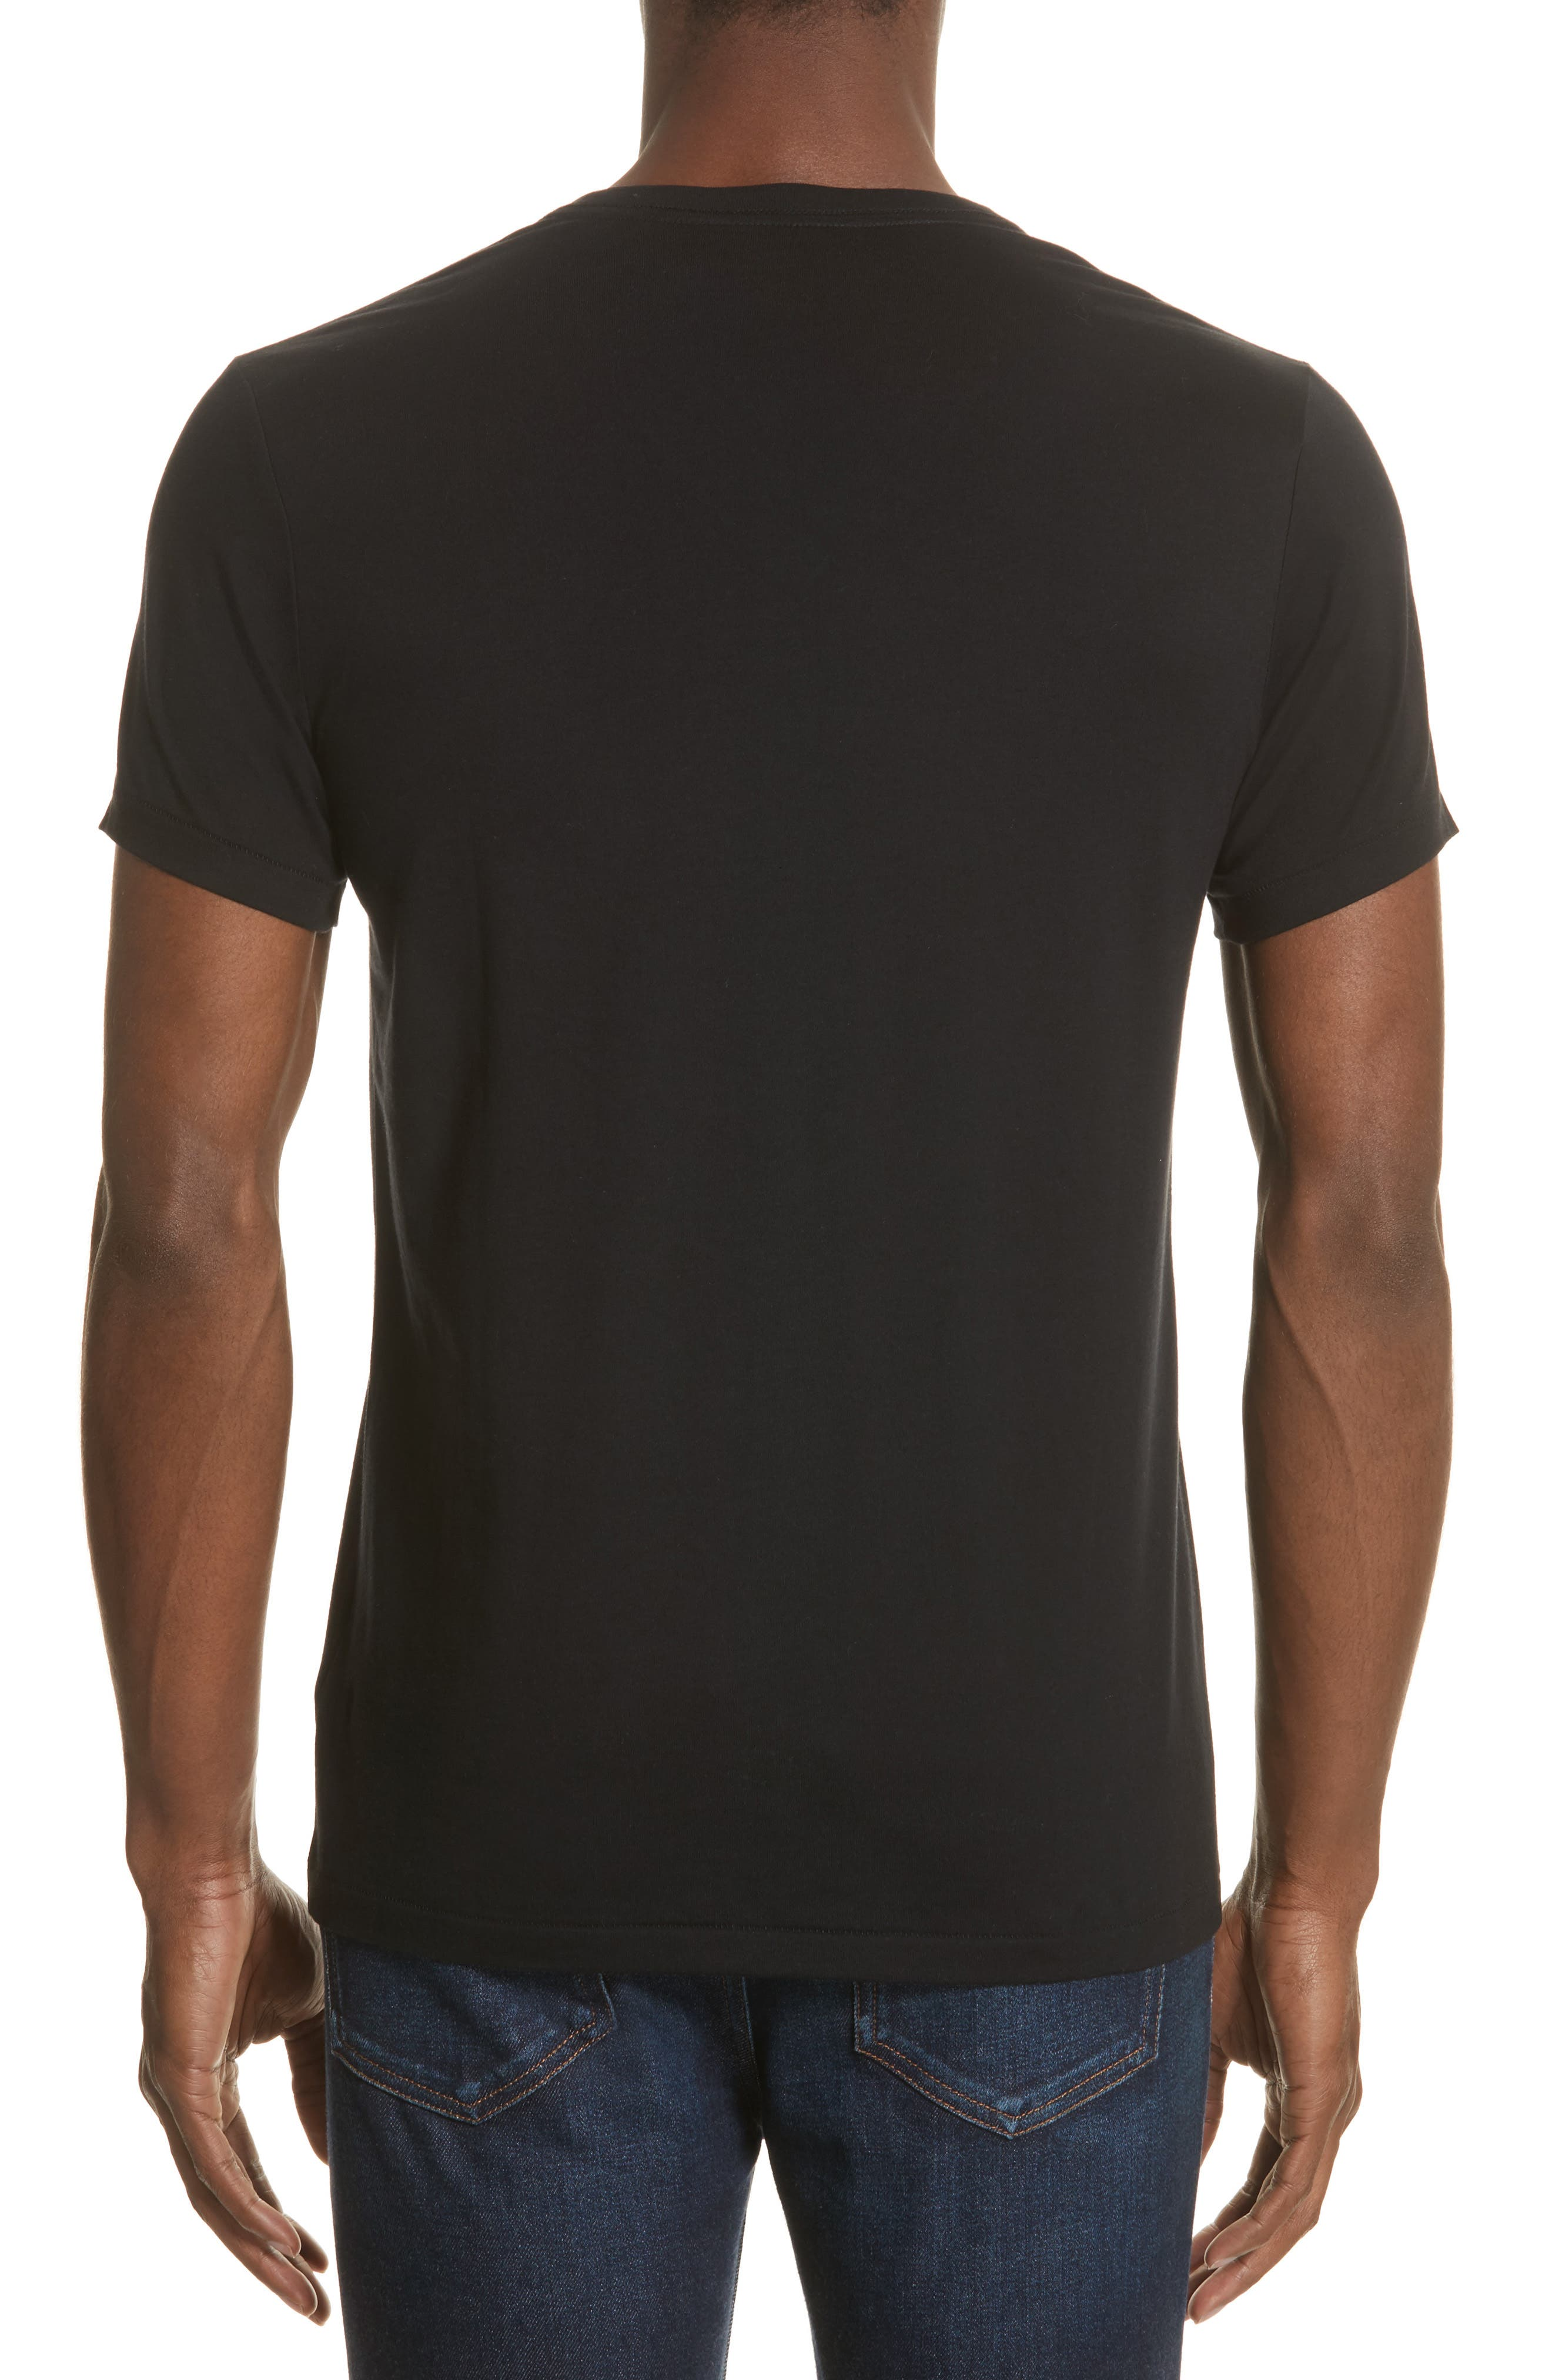 Jadforth V-Neck T-Shirt,                             Alternate thumbnail 2, color,                             BLACK